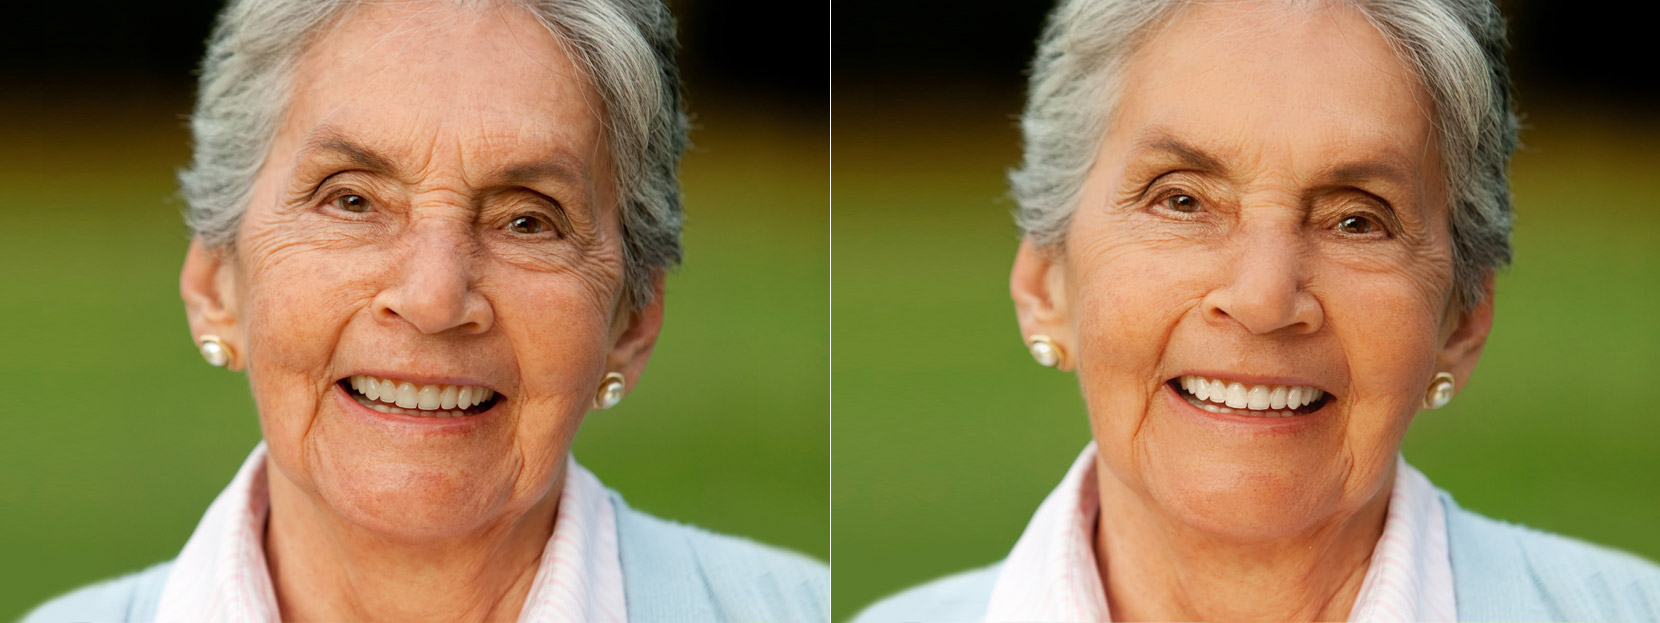 Fast Photo Editing,  Photo Retouch,  Image Resize